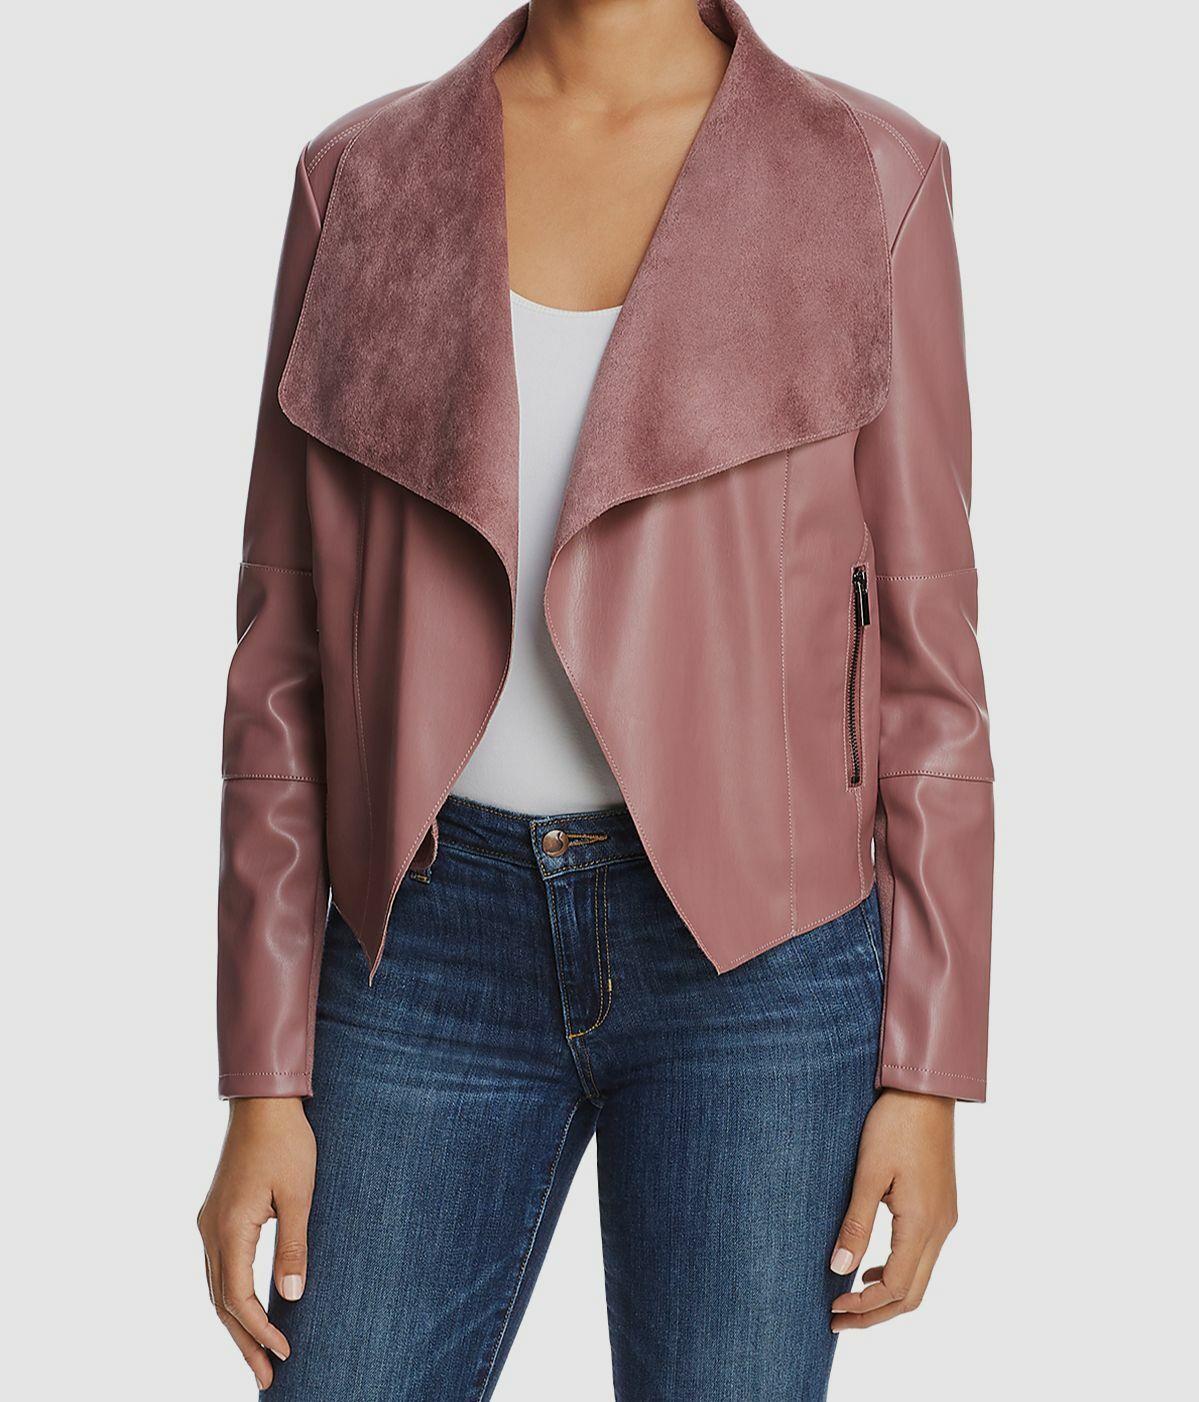 Bagatelle Women's Pink Draped Open-Front Long-Sleeve Casual Jacket Size S